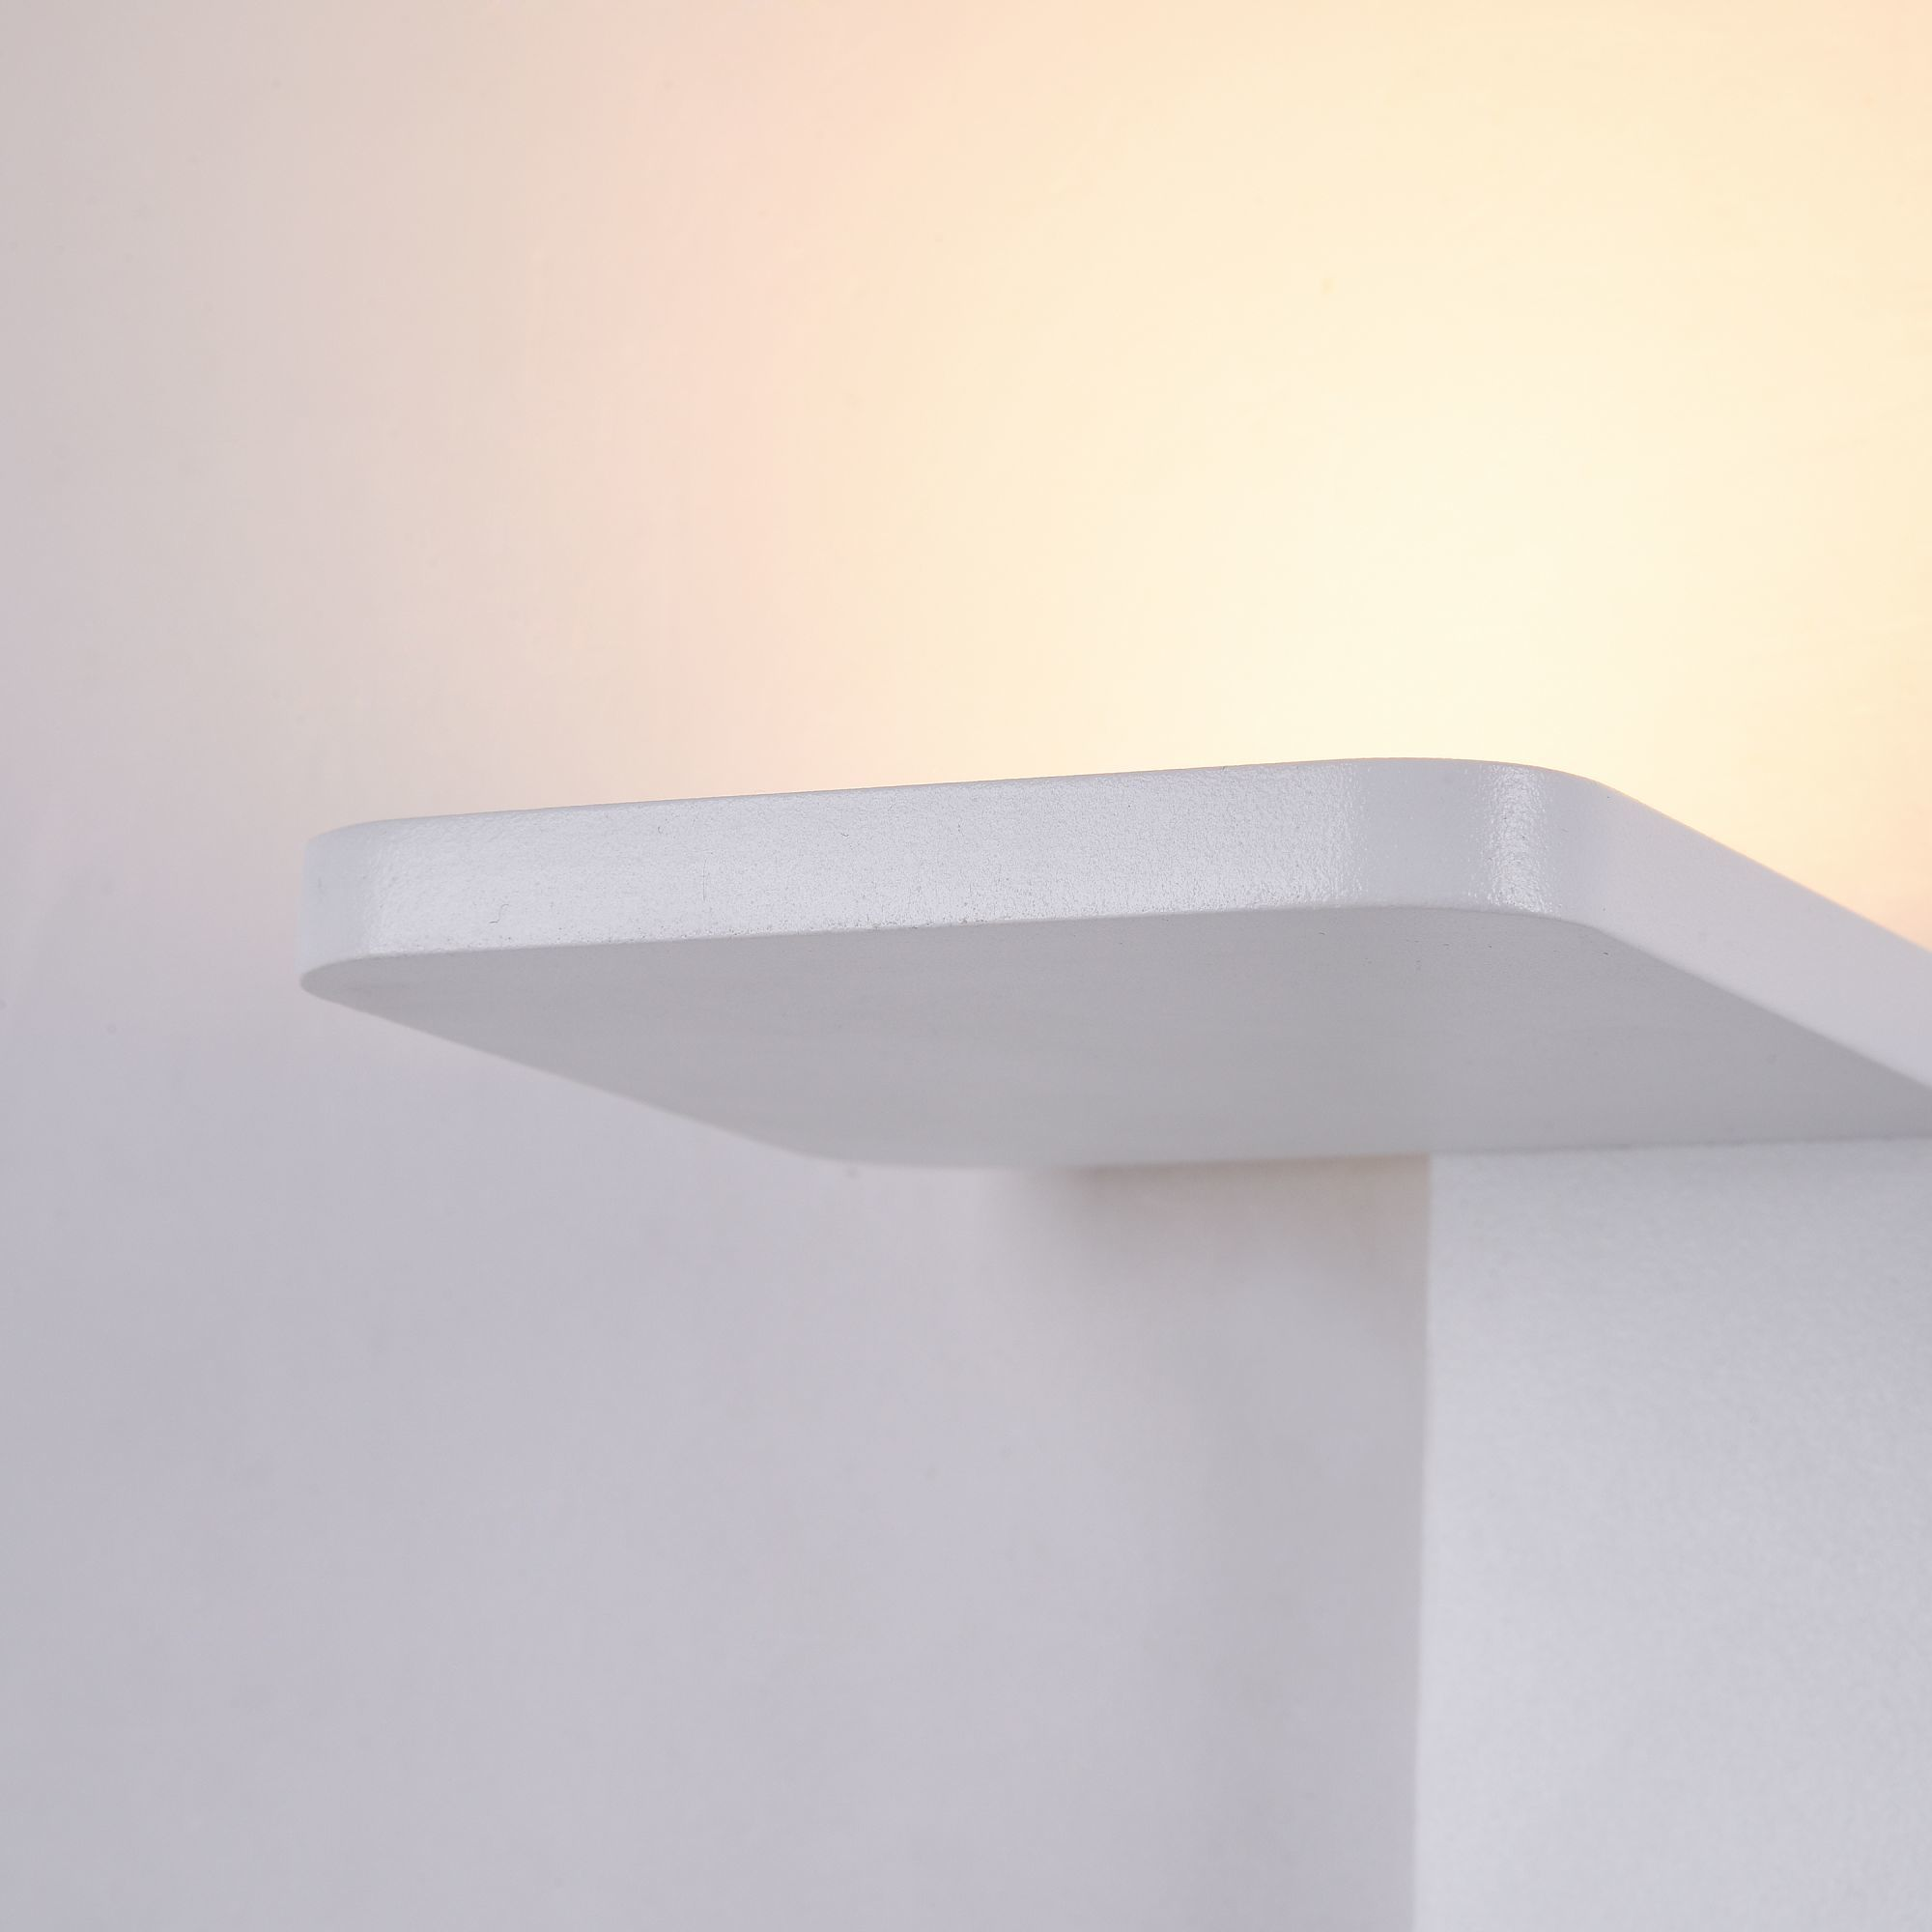 Настенный светодиодный светильник Maytoni Trame C807WL-L7W, LED SMD 2835 7W 3000K 350lm CRI84, белый, металл, стекло - фото 7